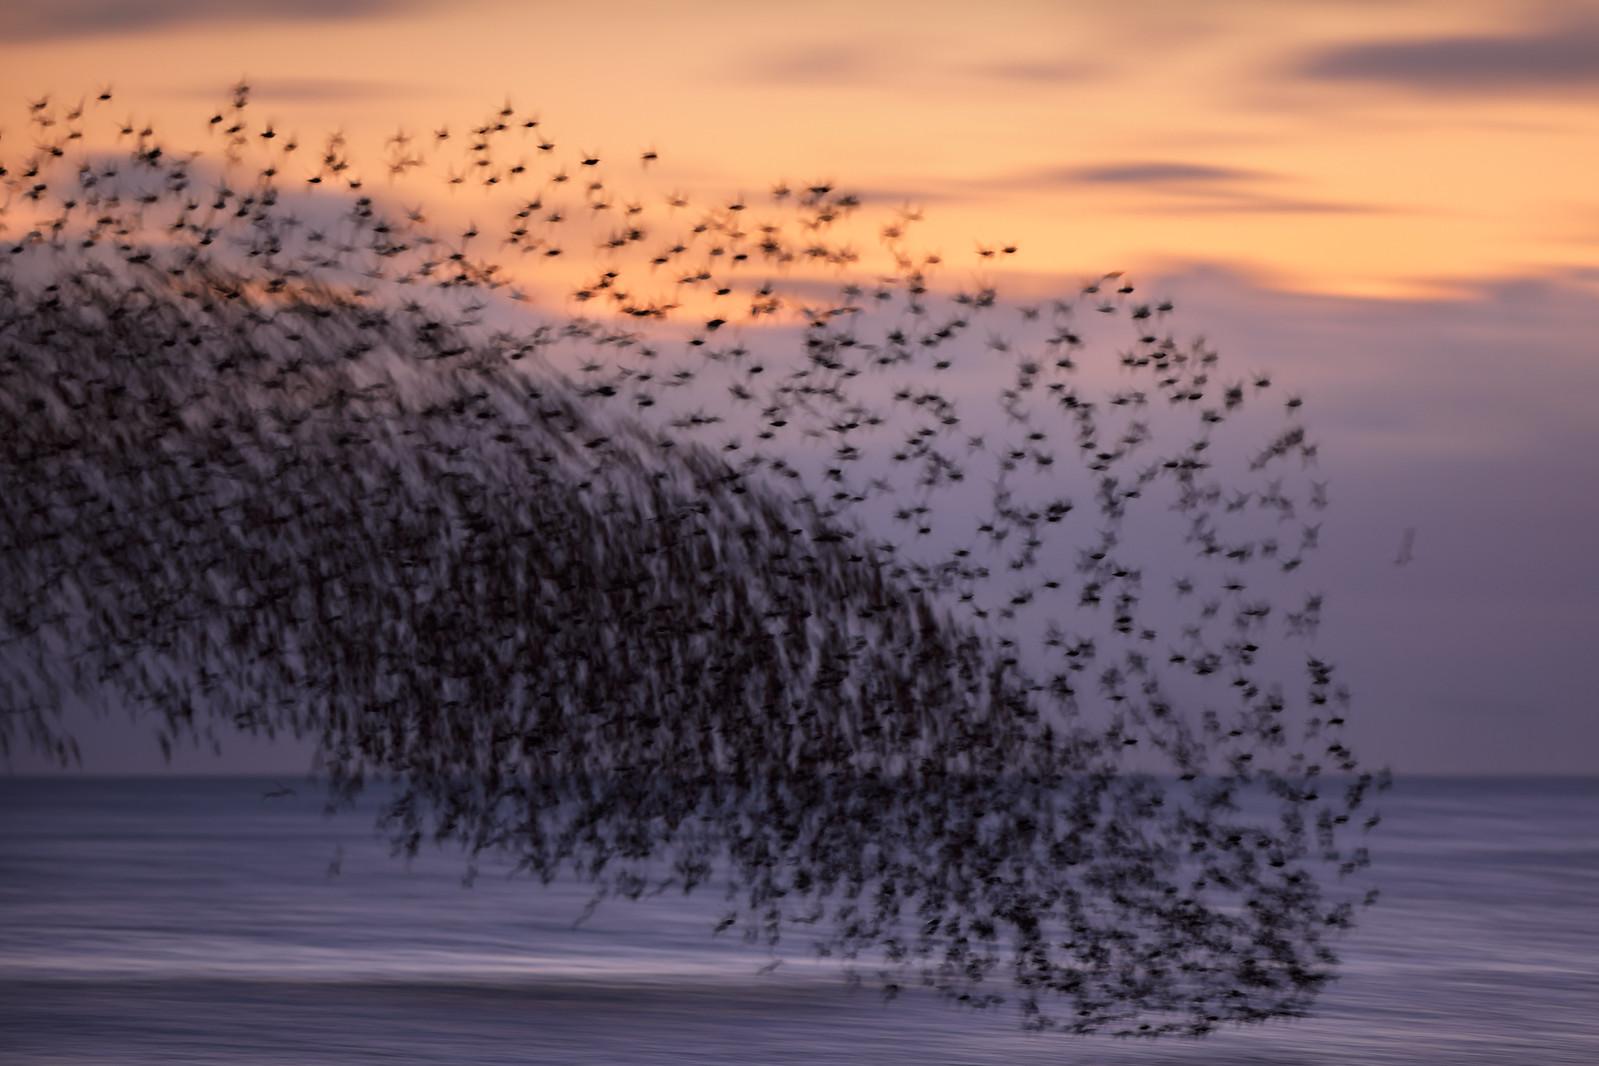 Brighton Starling Murmuration - Motion Blur